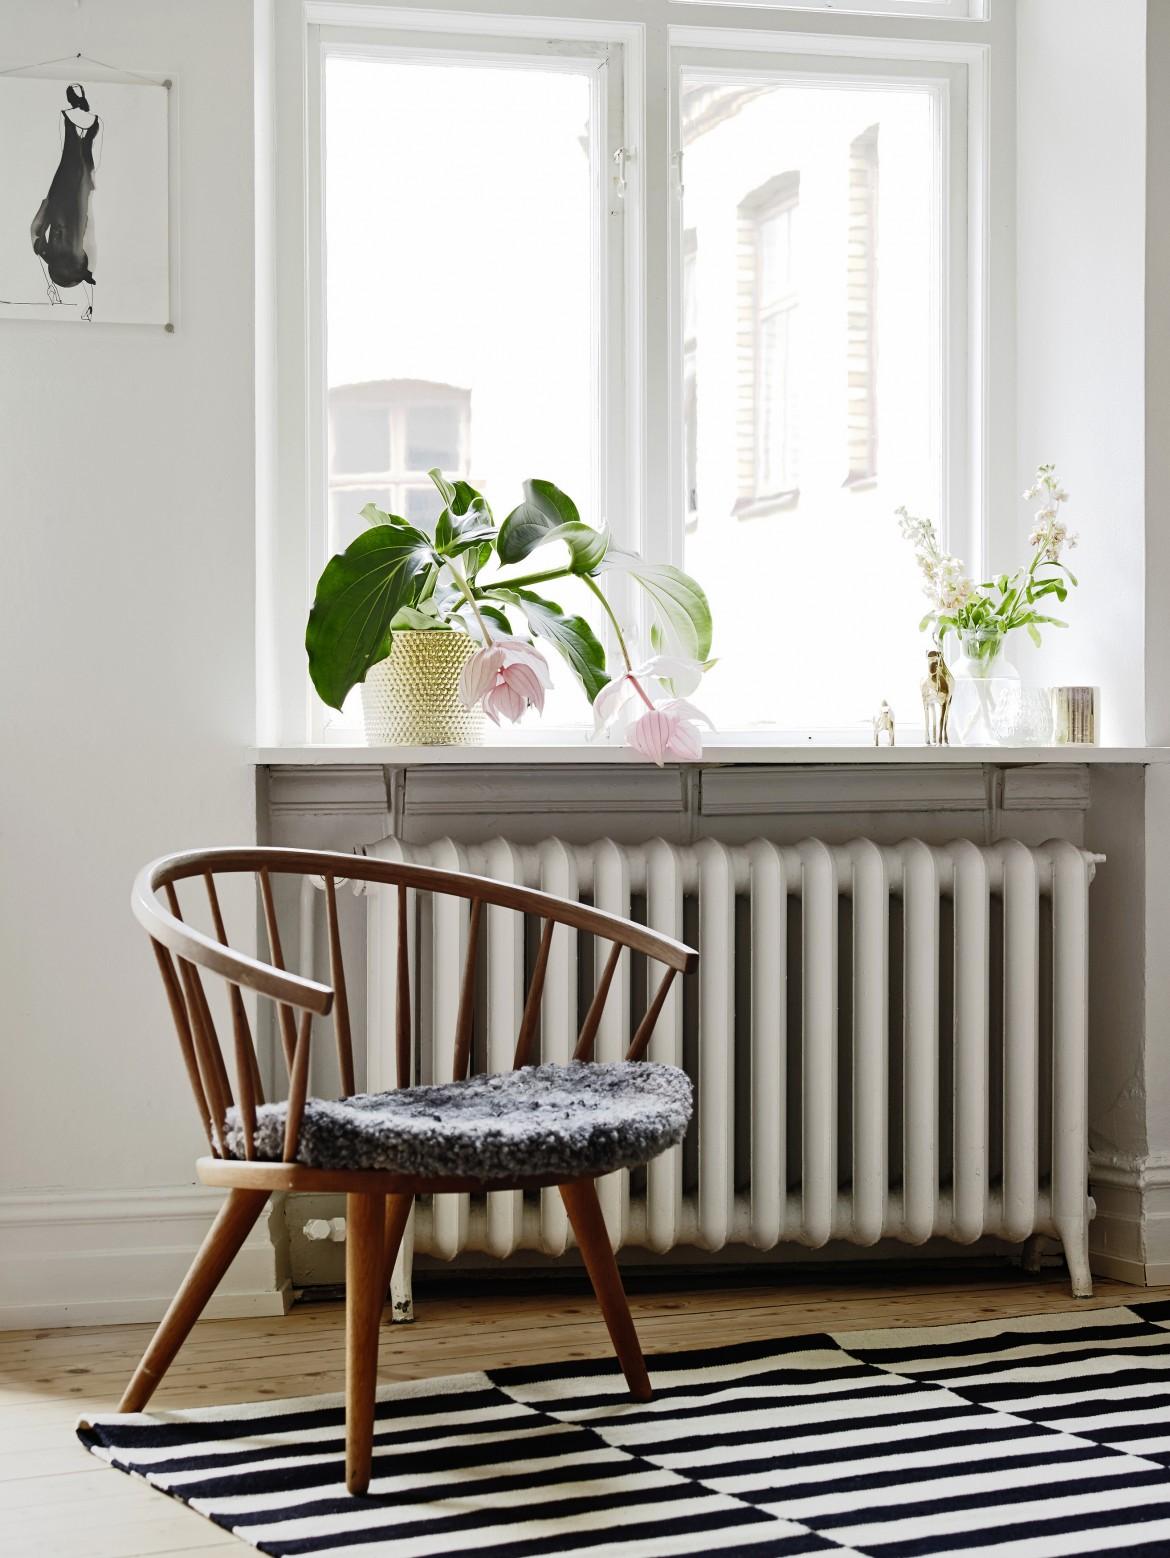 silla al lado de la ventana